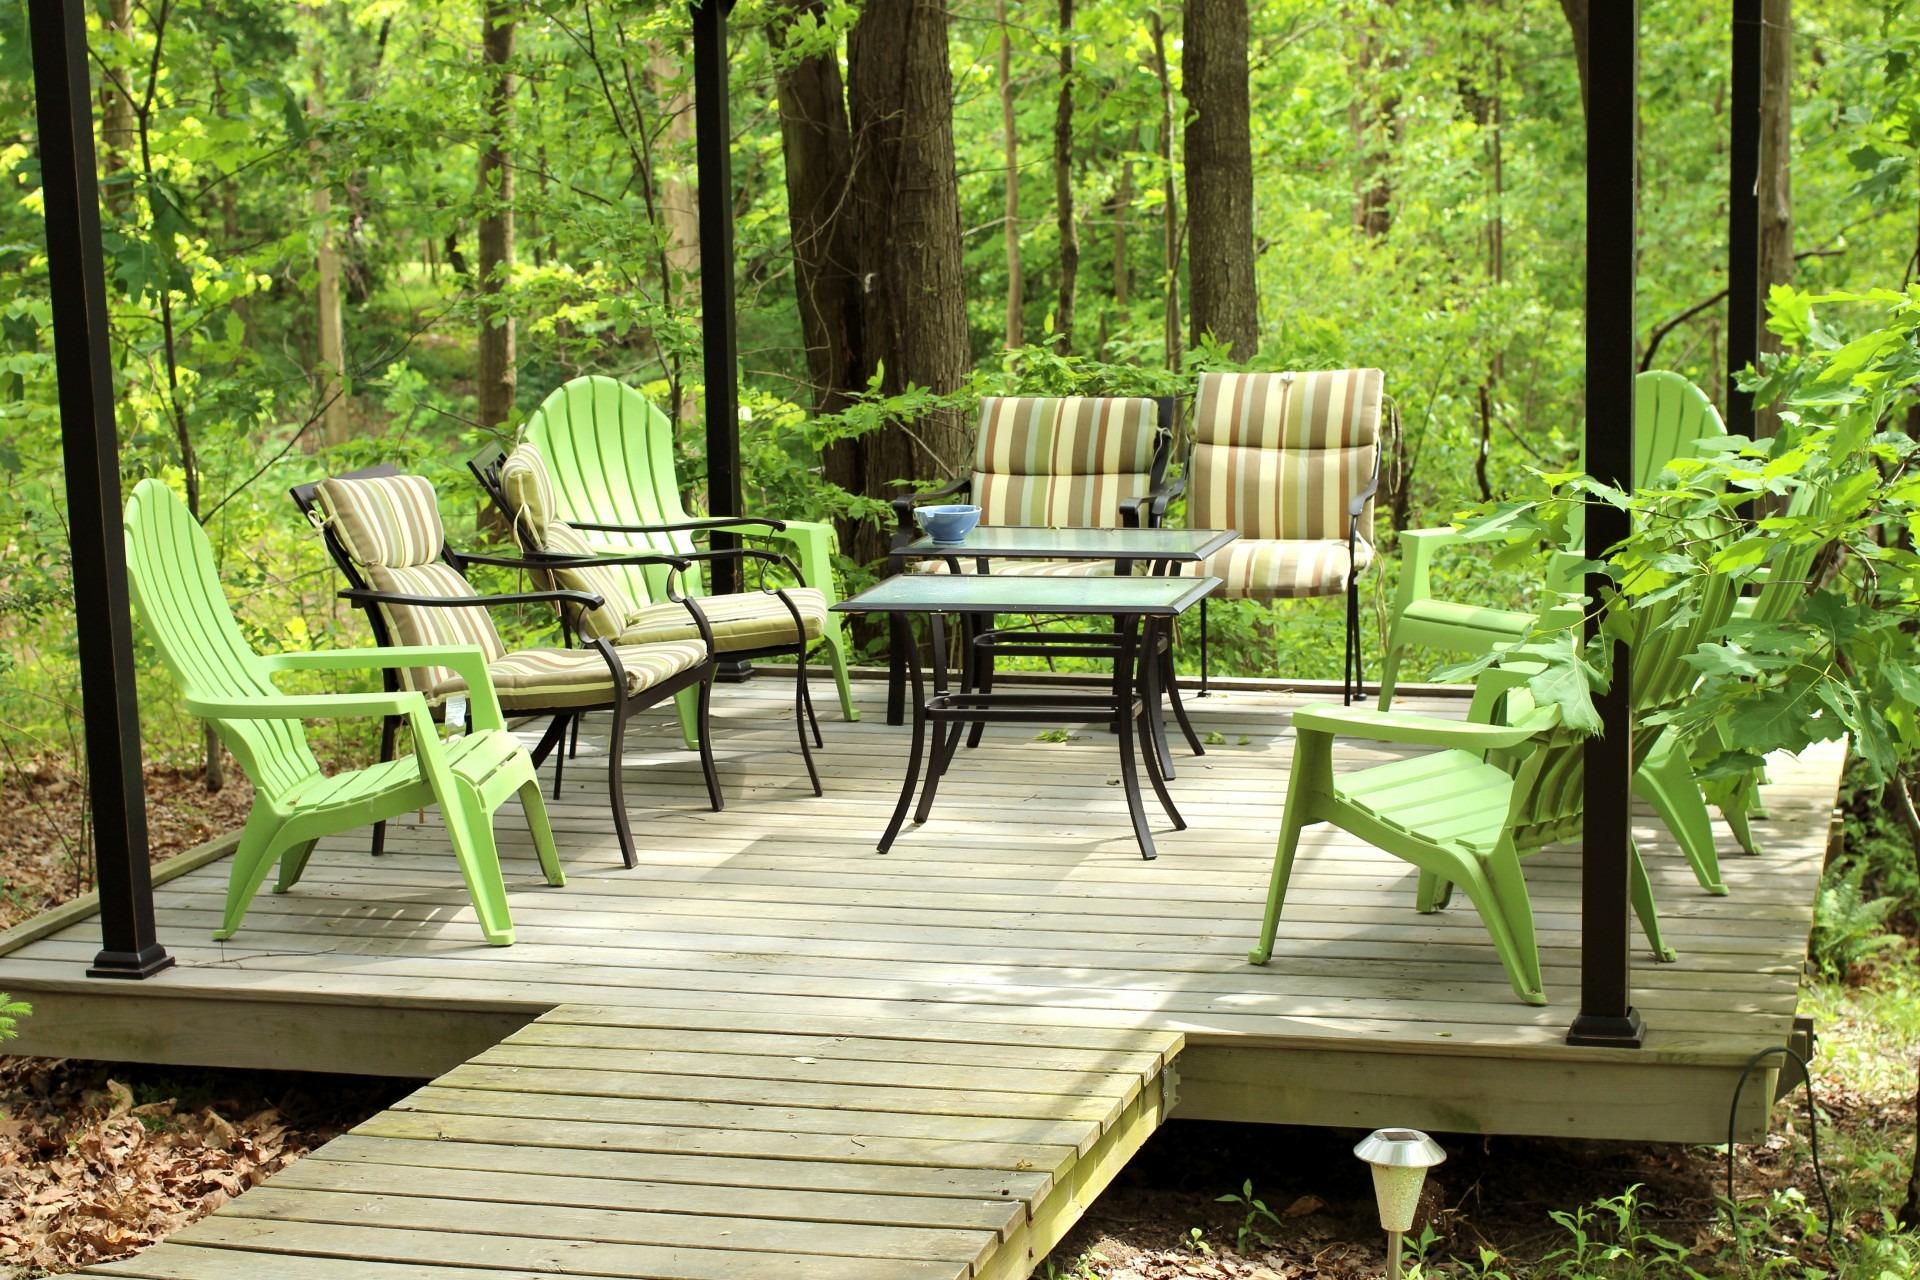 Fotos gratis : bosque, cubierta, césped, porche, cabaña, patio ...